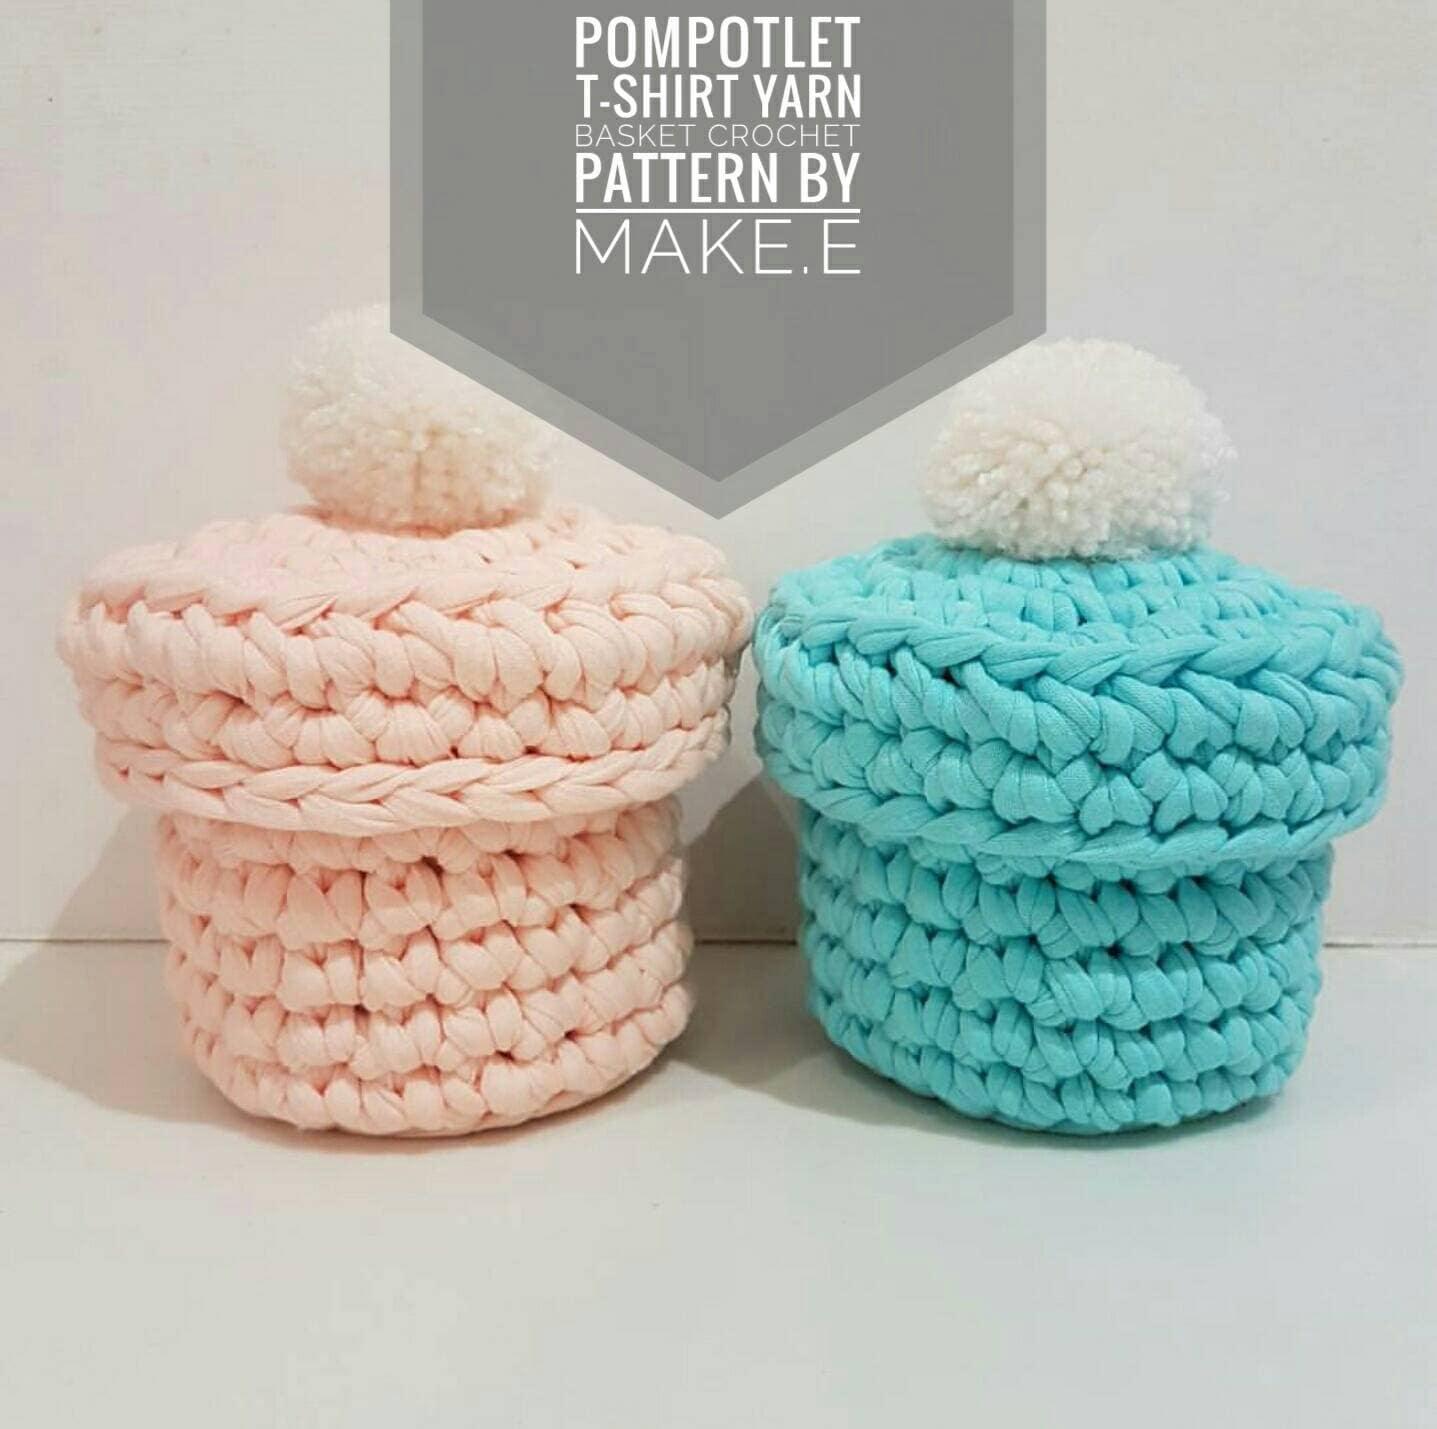 T shirt yarn pompotlet basket crochet pattern dt1010fo